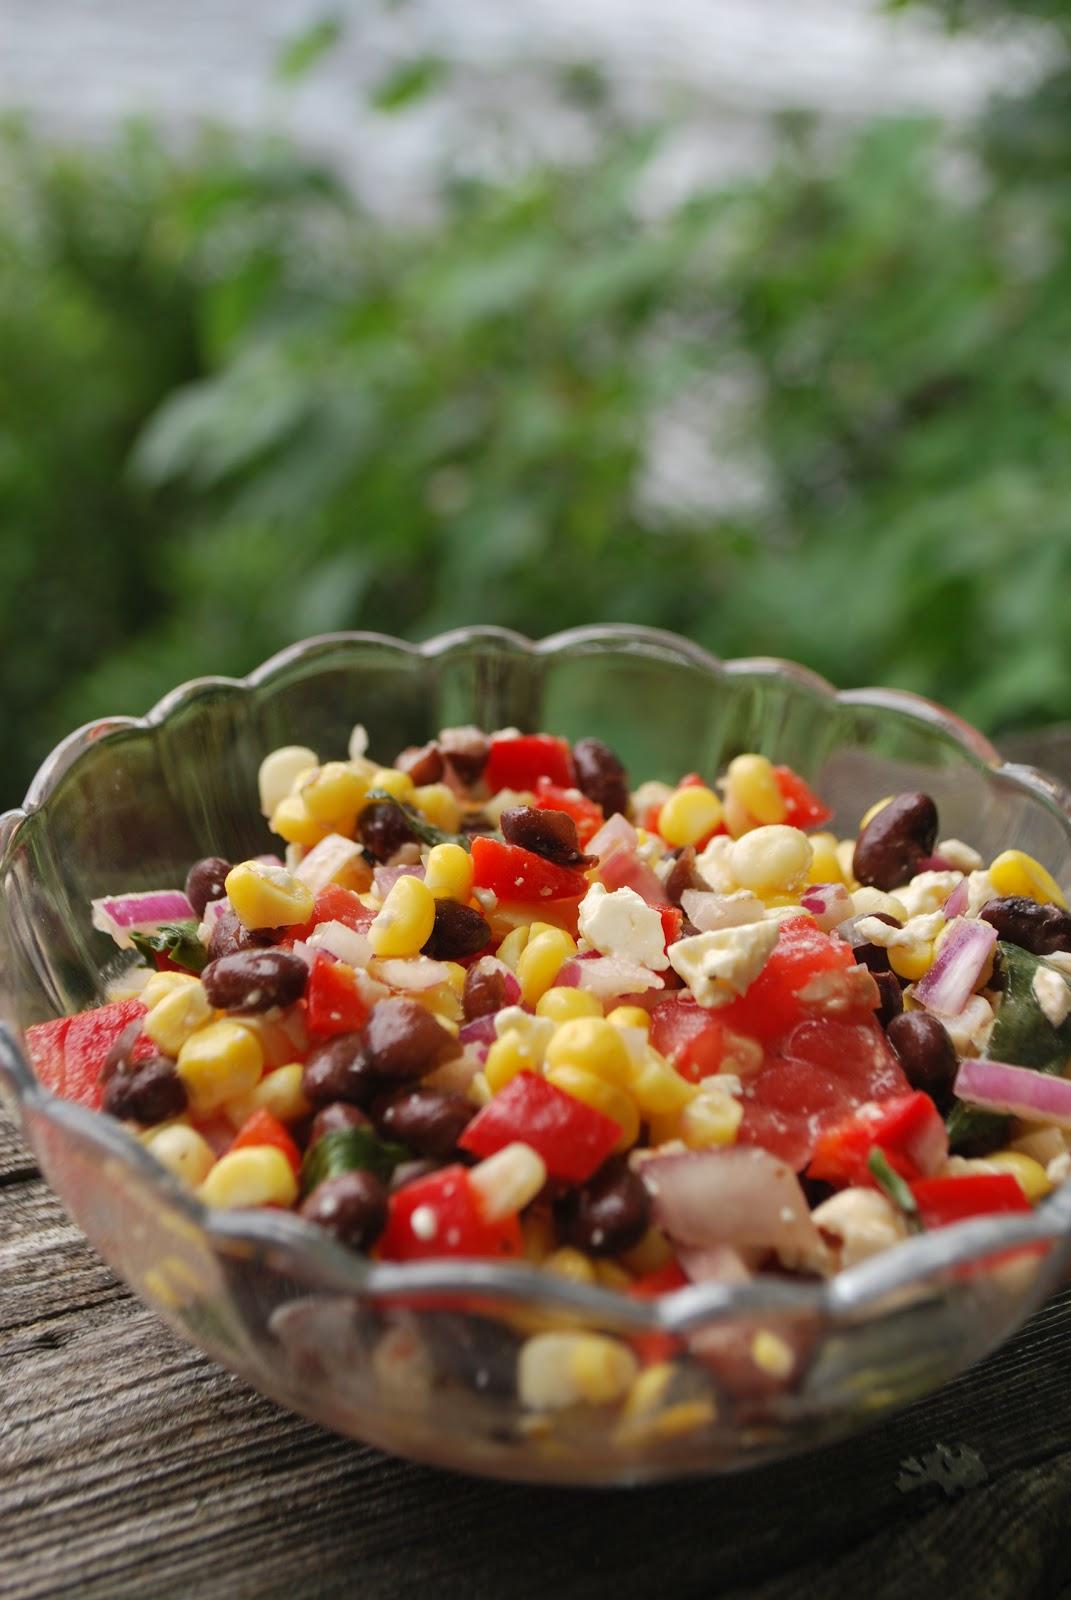 Scrumpdillyicious: Black Bean, Corn and Feta Salad